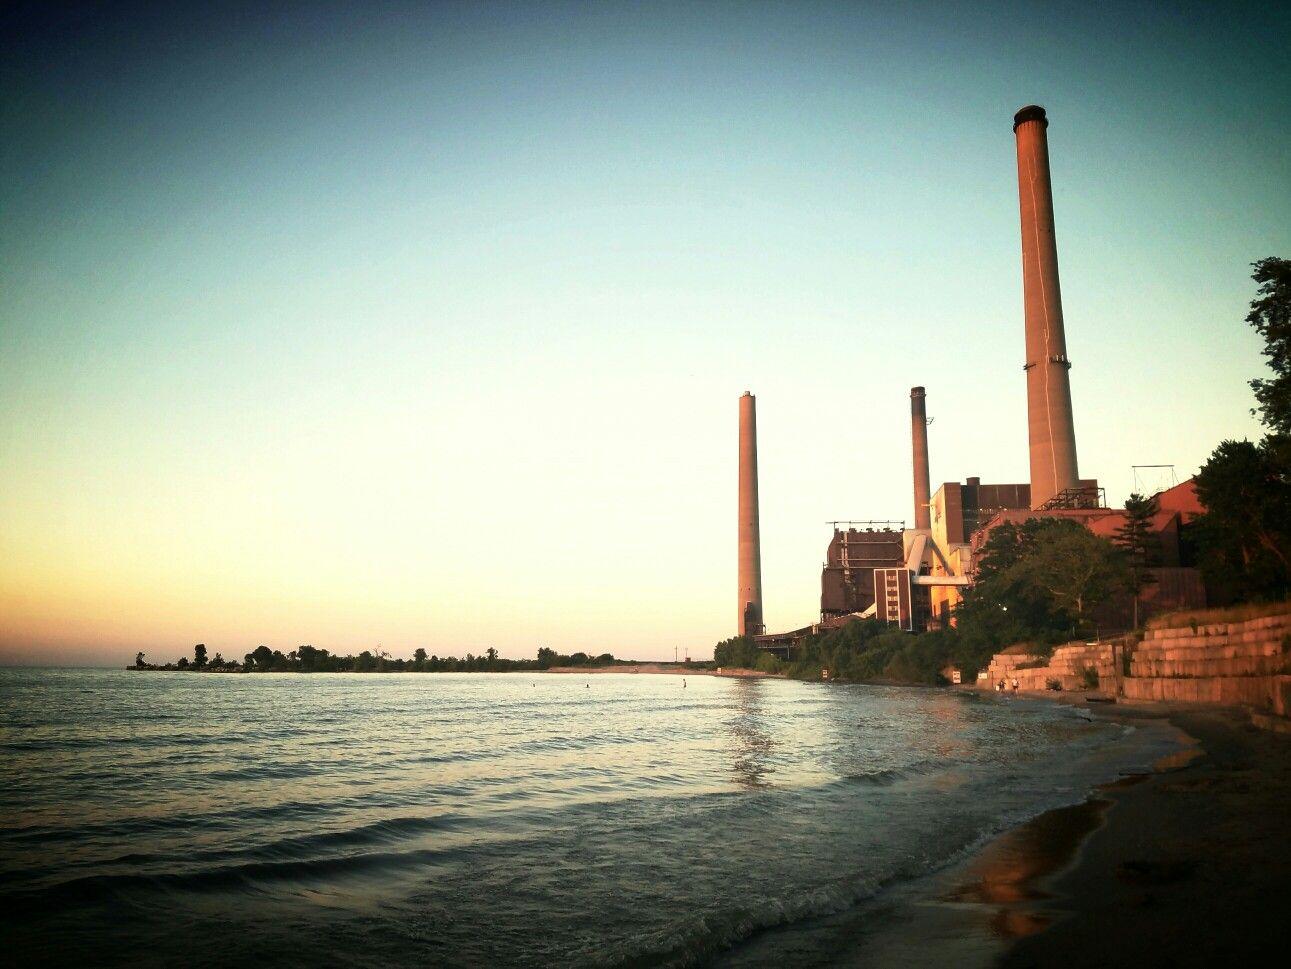 Power plant on Lake at sunset